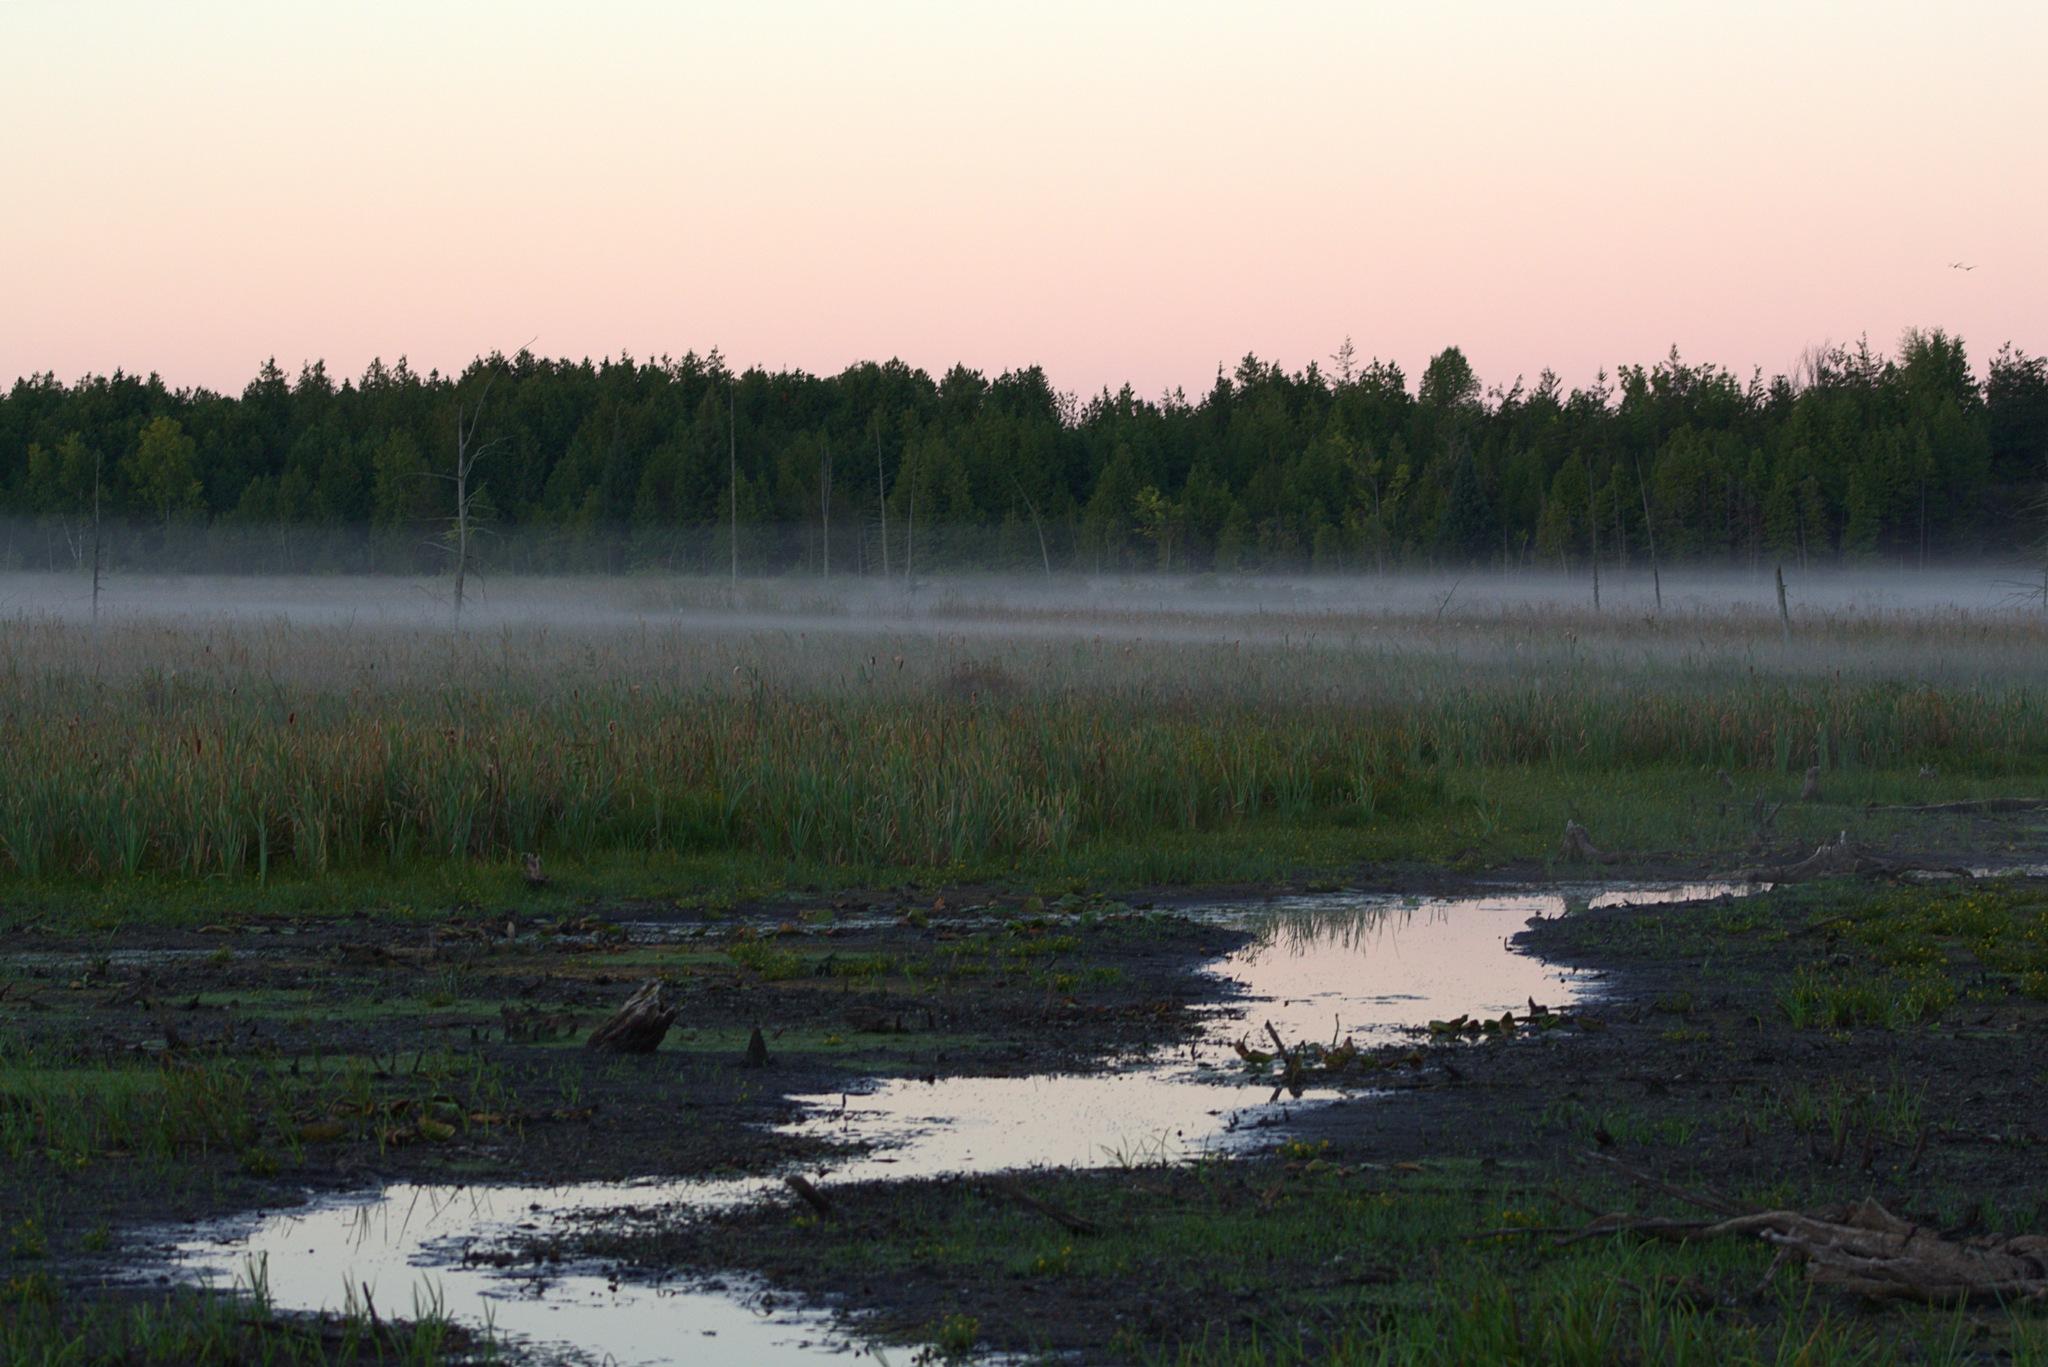 In the morning mist. by sakarasailor